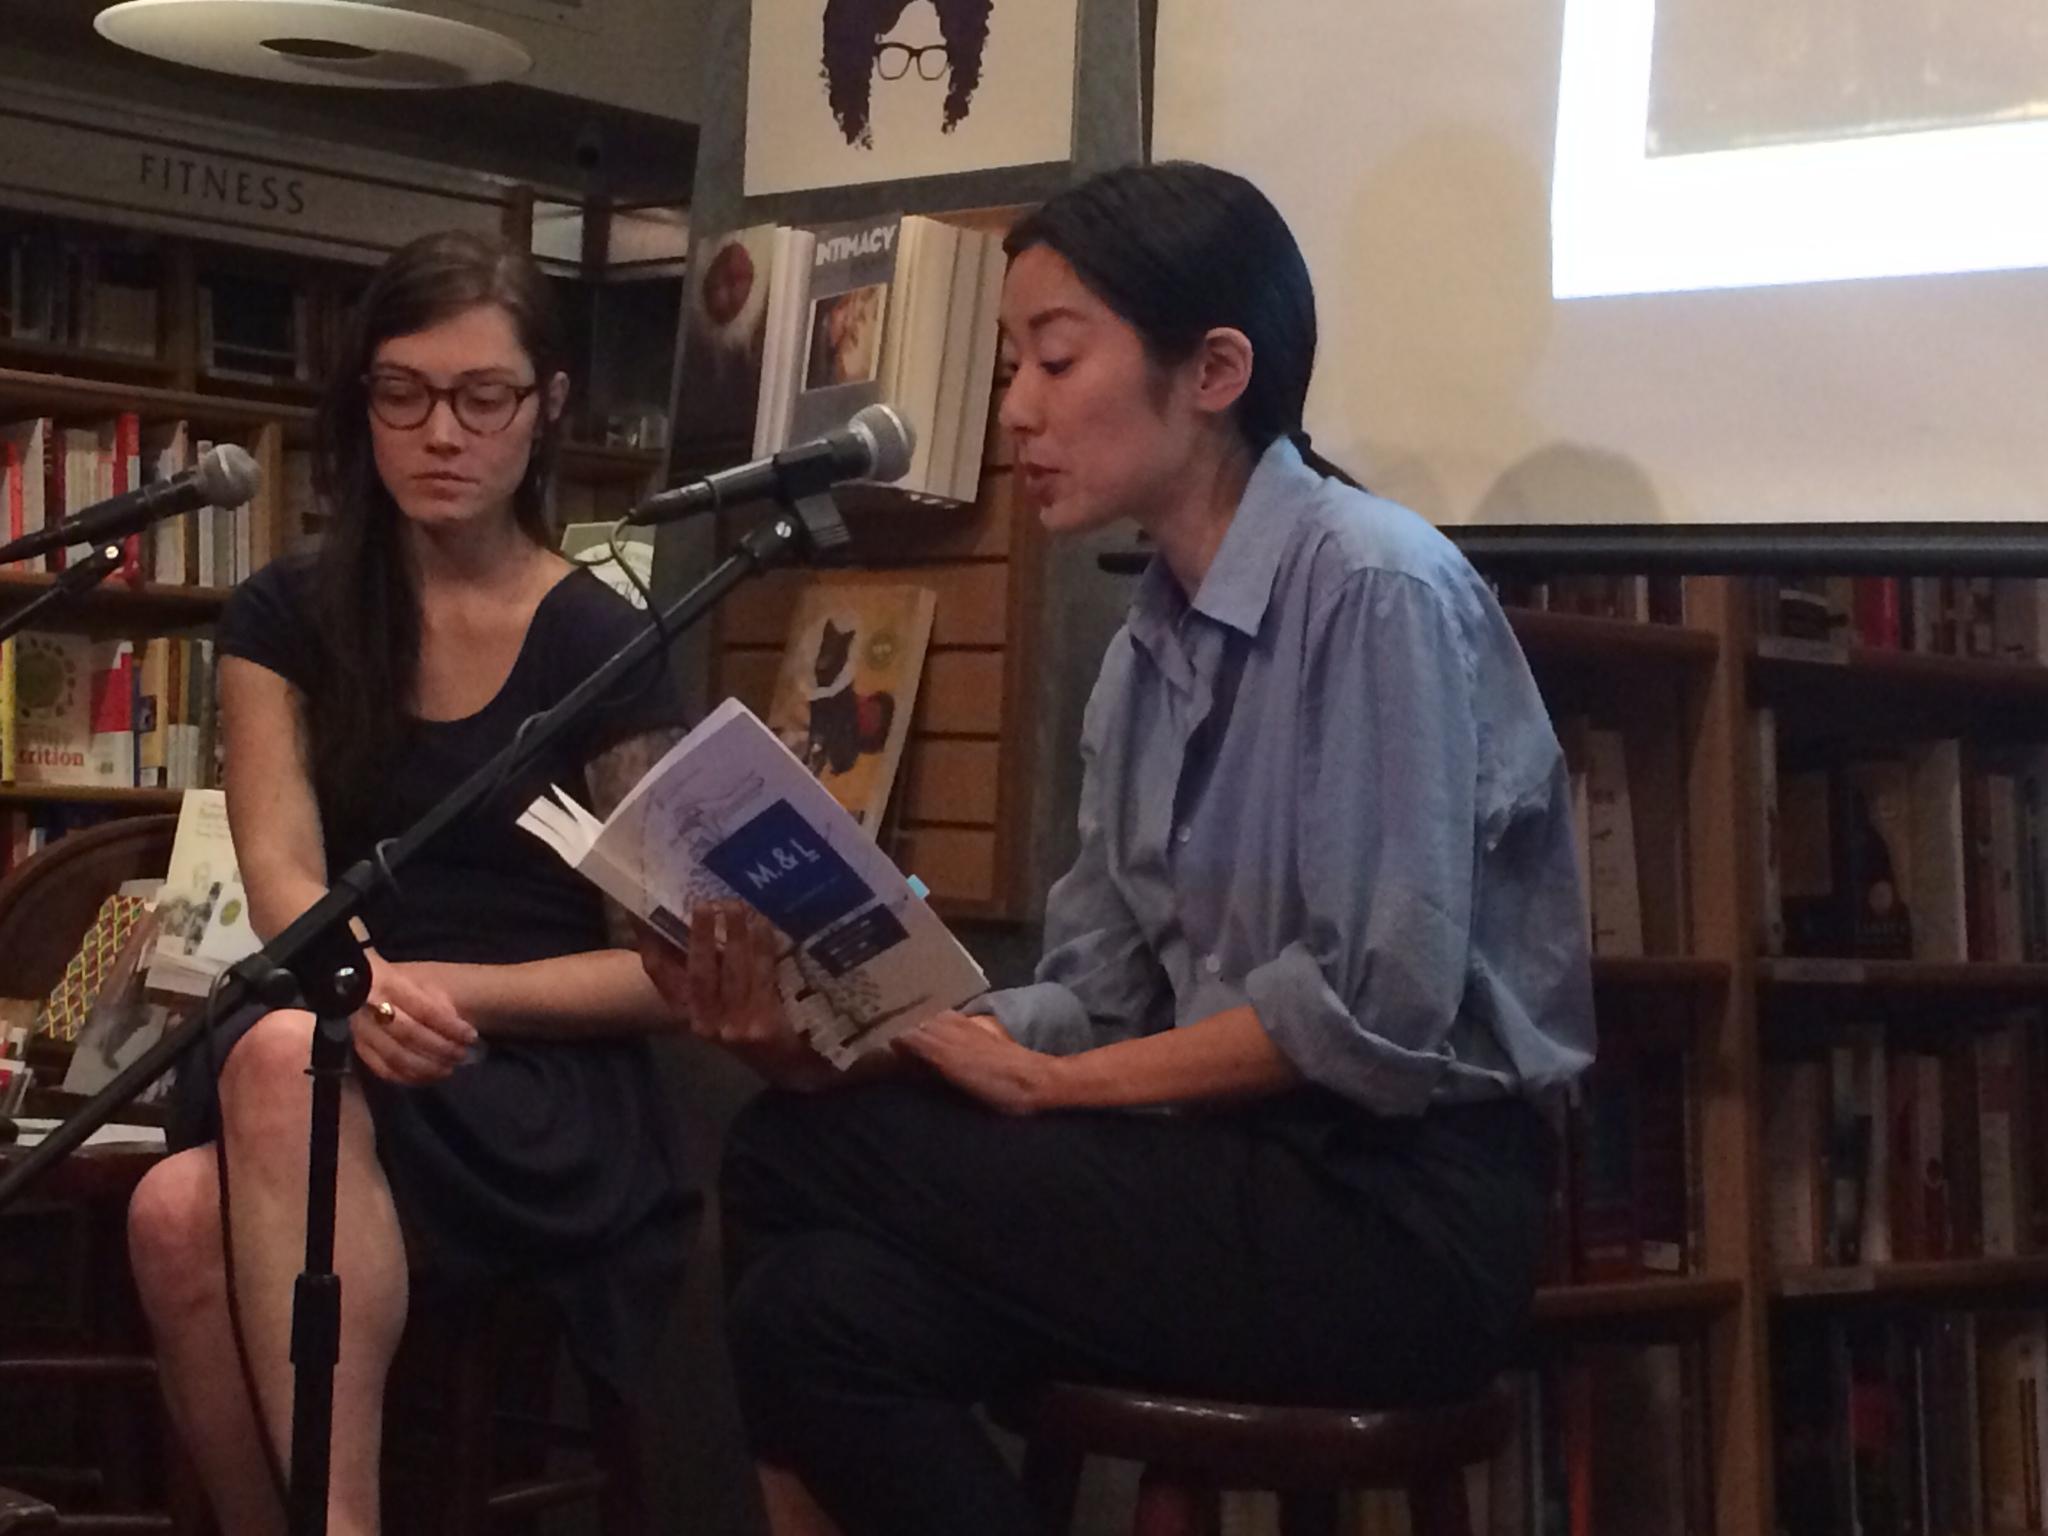 Sarah Gerard (left) and Katie Kitamura (right) discuss Clarice Lispector at McNally Jackson. Photo: Justin Alvarez.